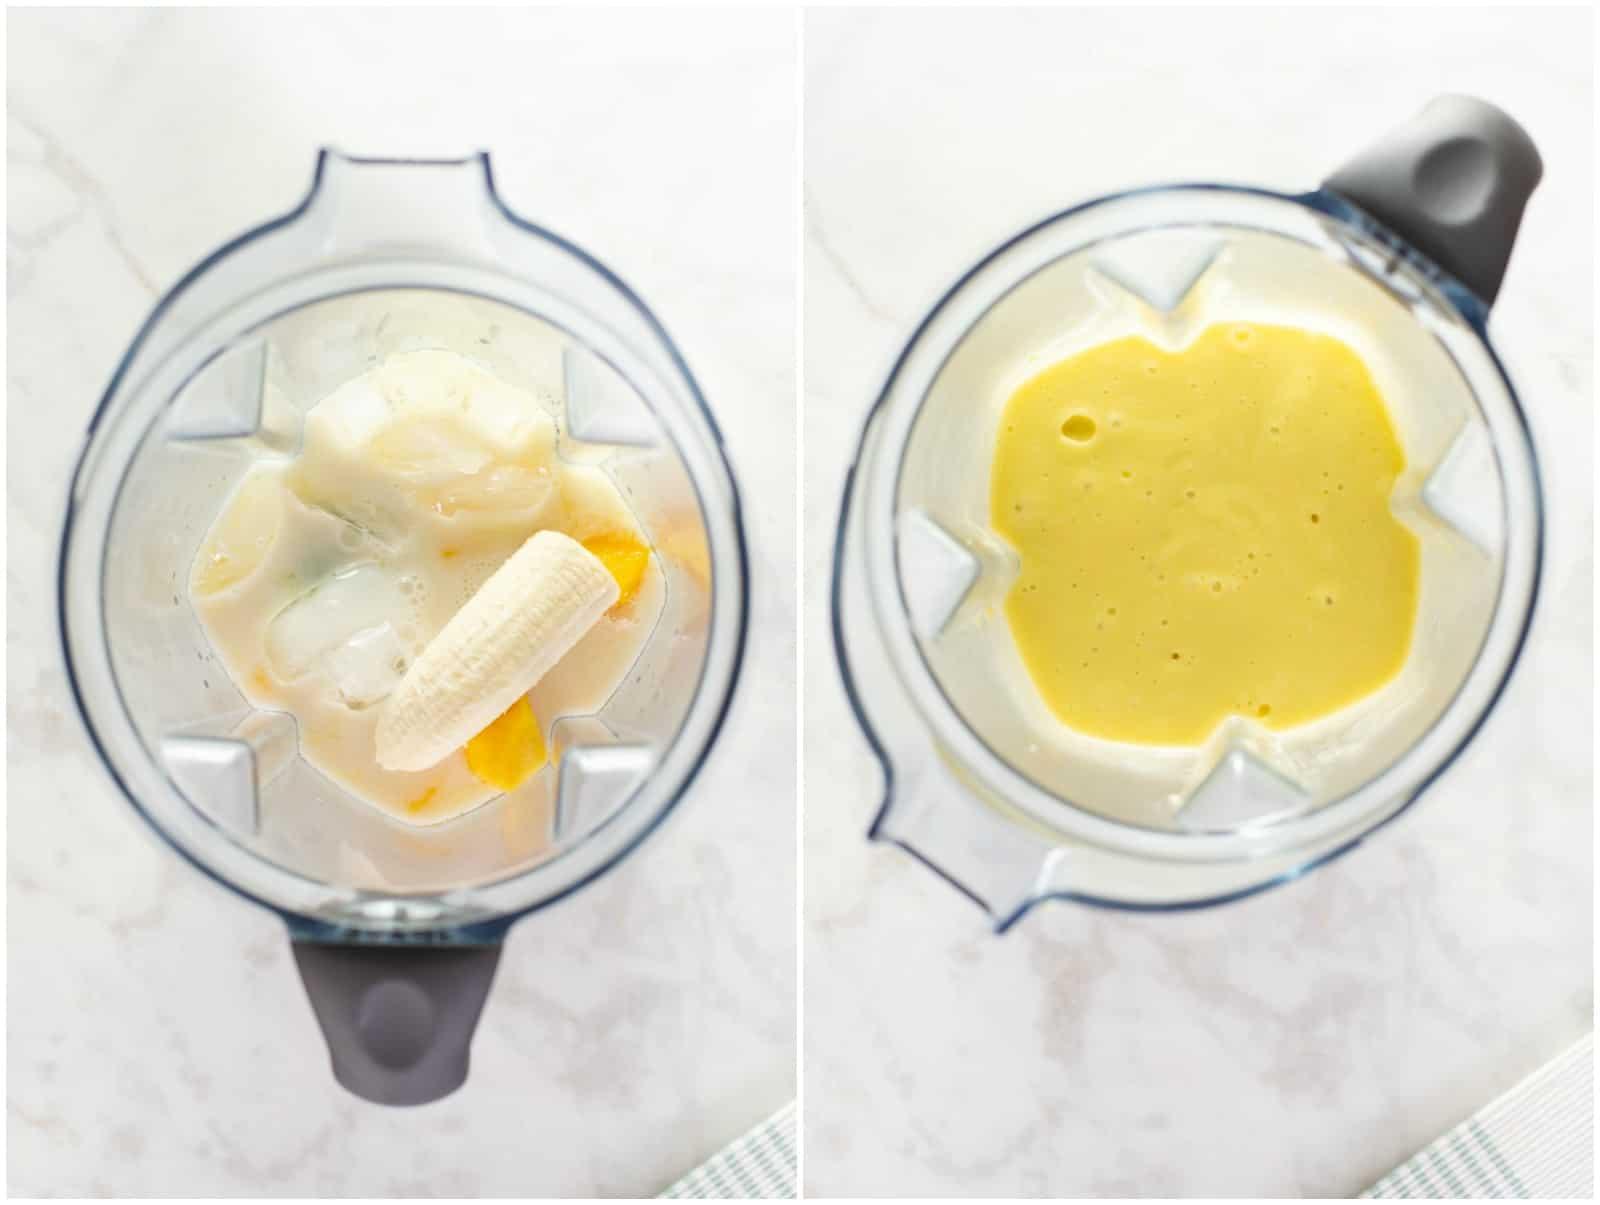 blending mango smoothie until smooth